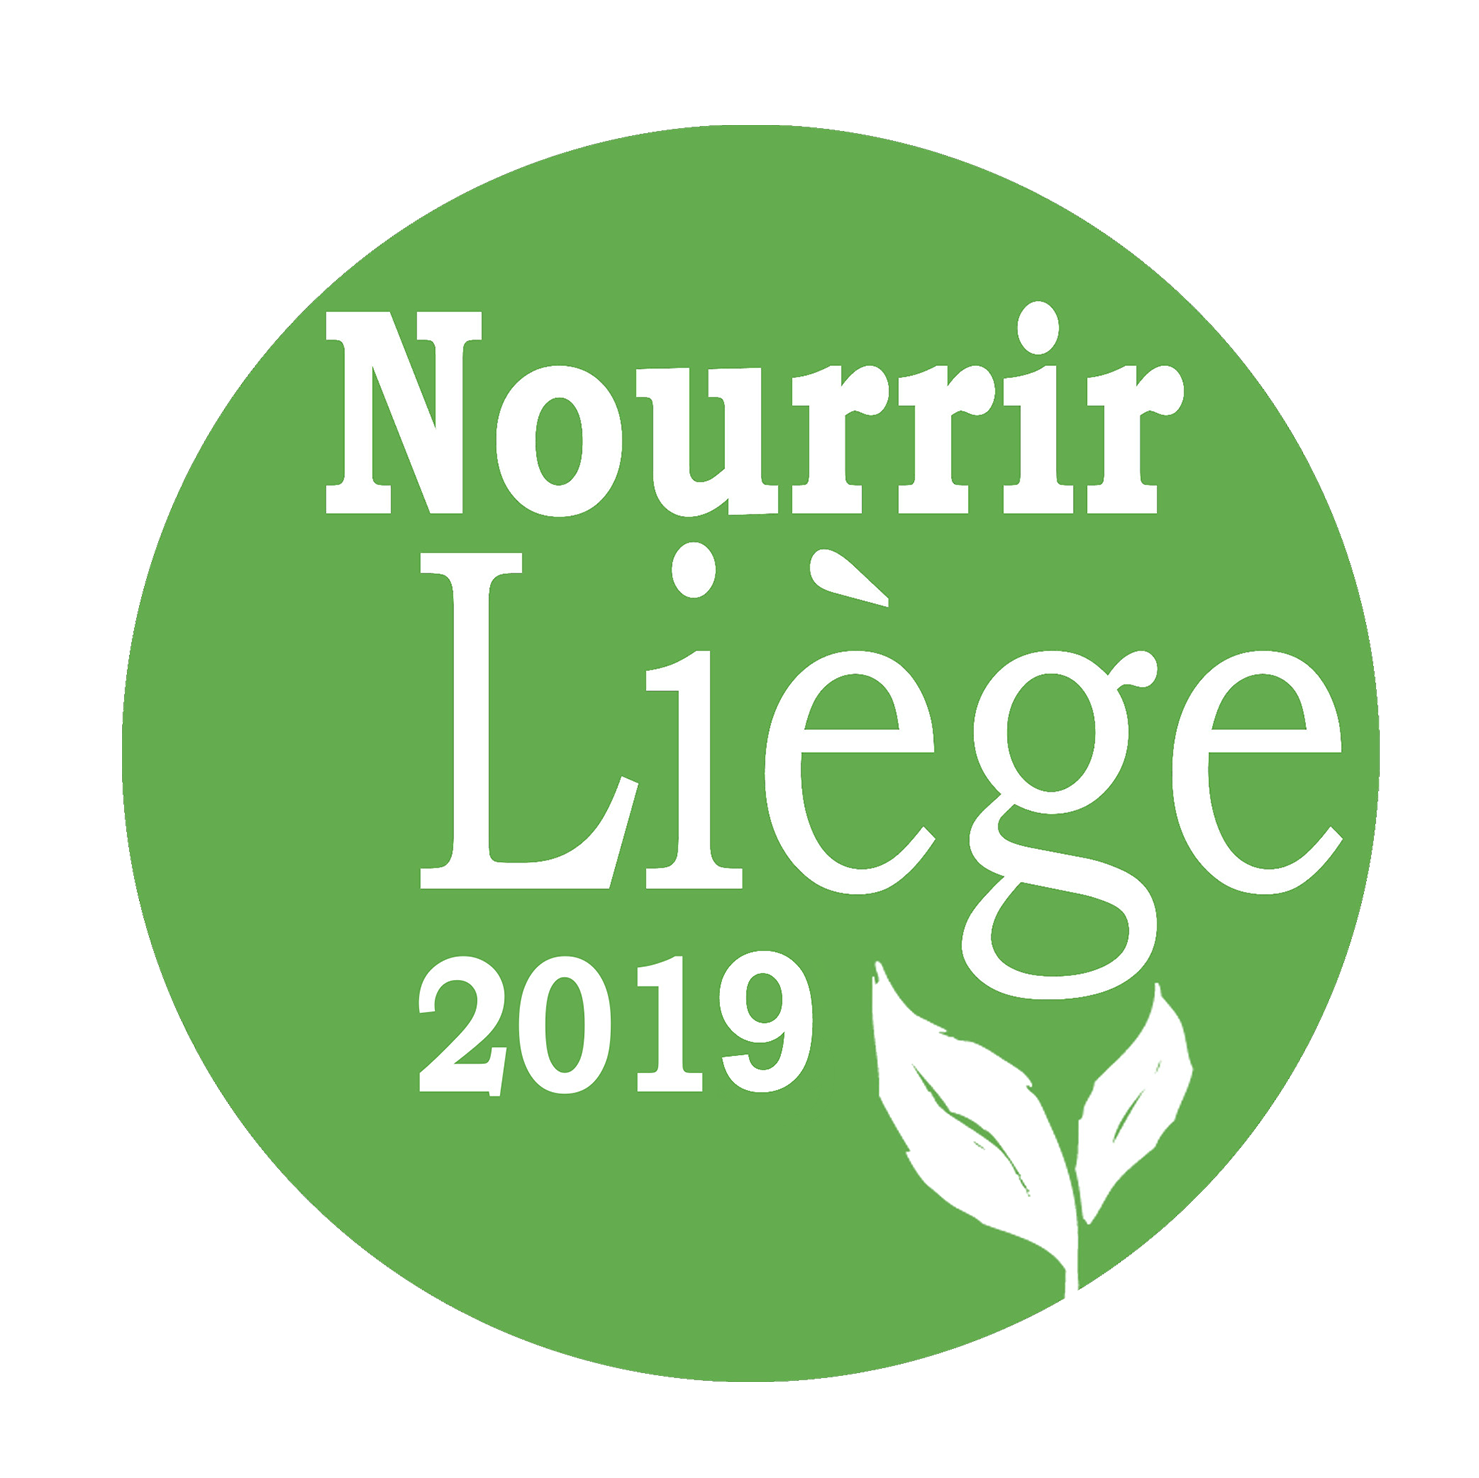 nourrir liege 2019 logo home